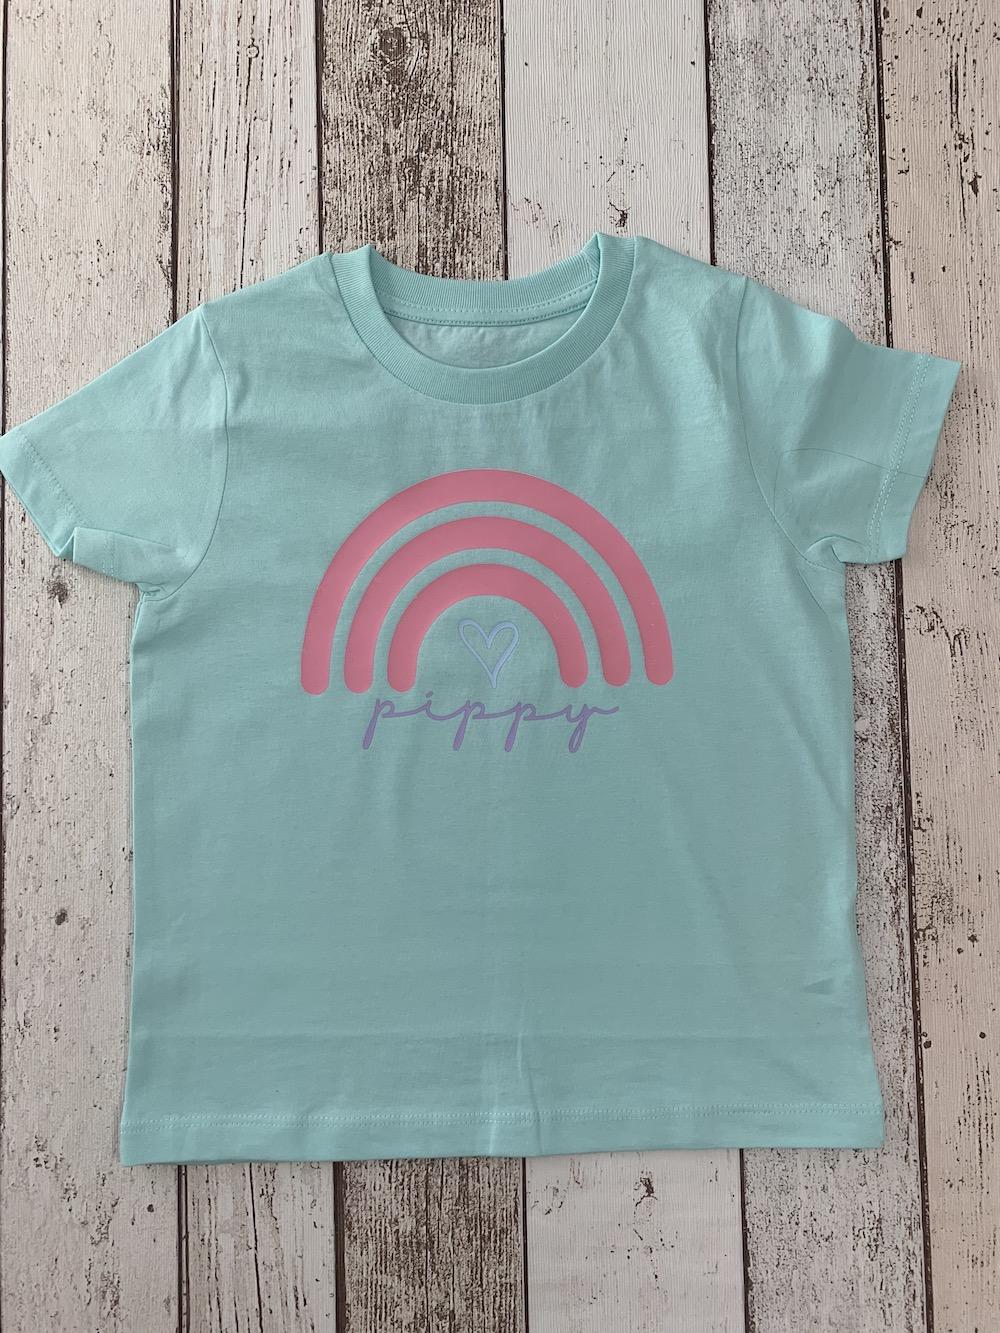 Rainbow Personalised Tshirt – Mint Green